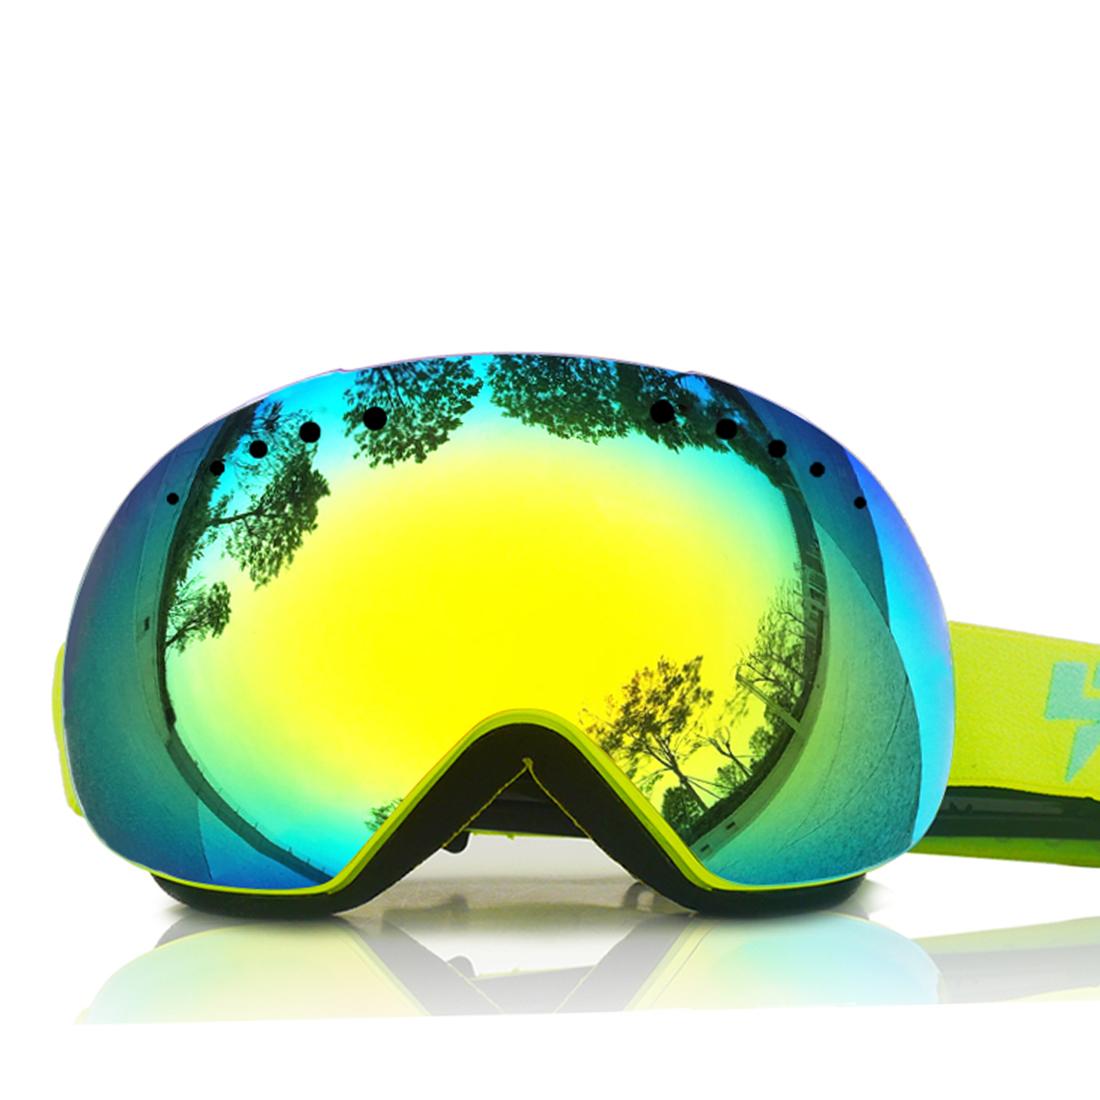 LY-100 Authorized Ski Snowmobile Snowboard Goggles Anti-fog UV400 Protect OTG Anti-slip YW